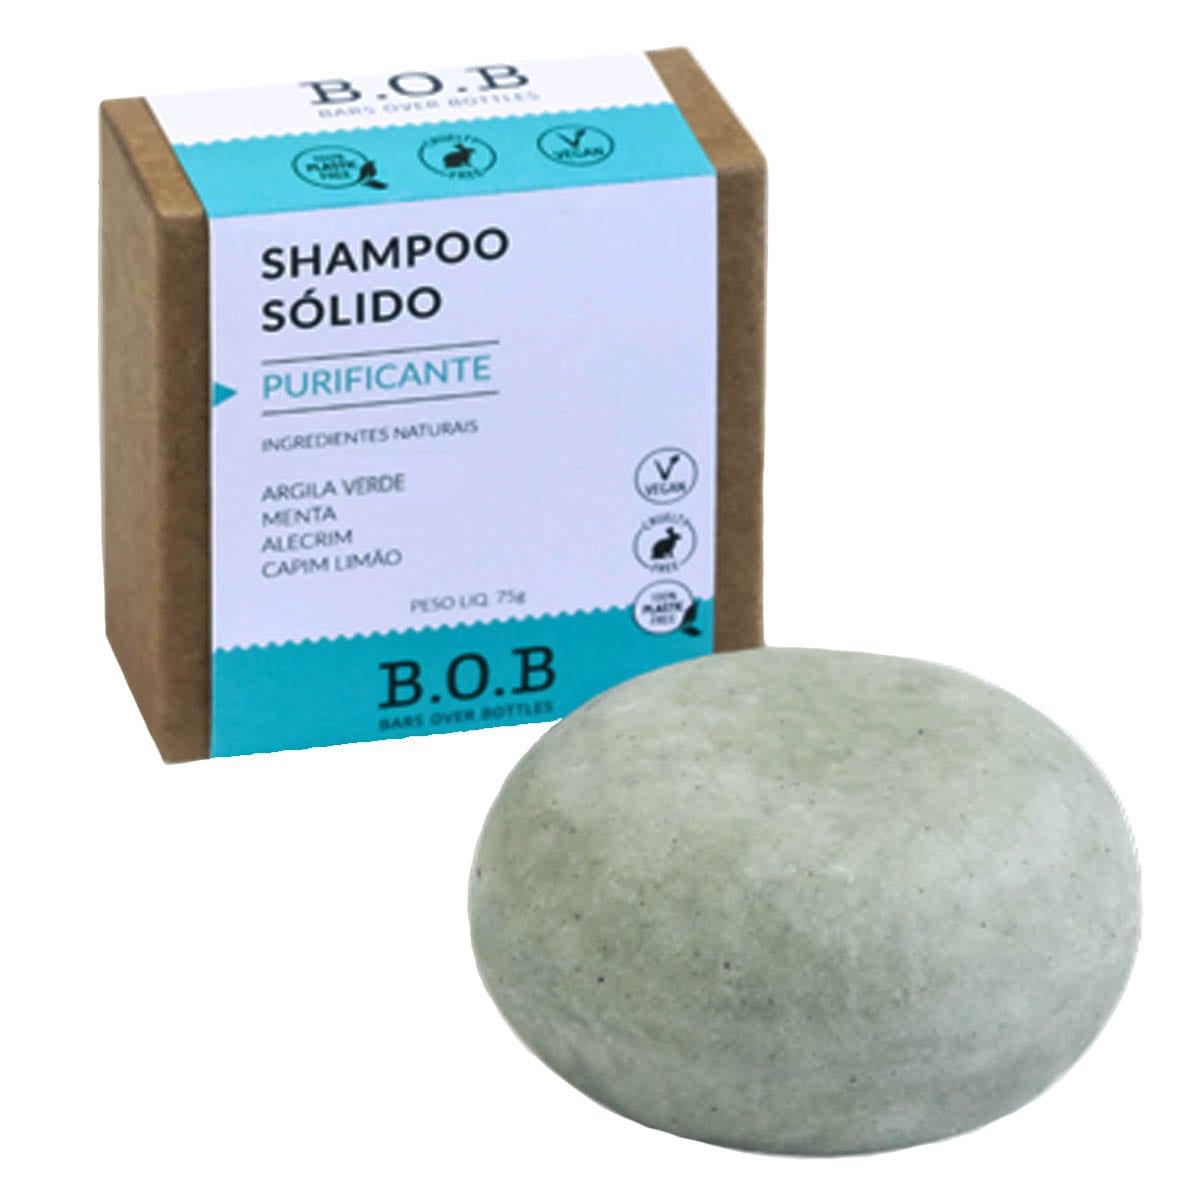 Shampoo sólido purificante 75g - B.O.B